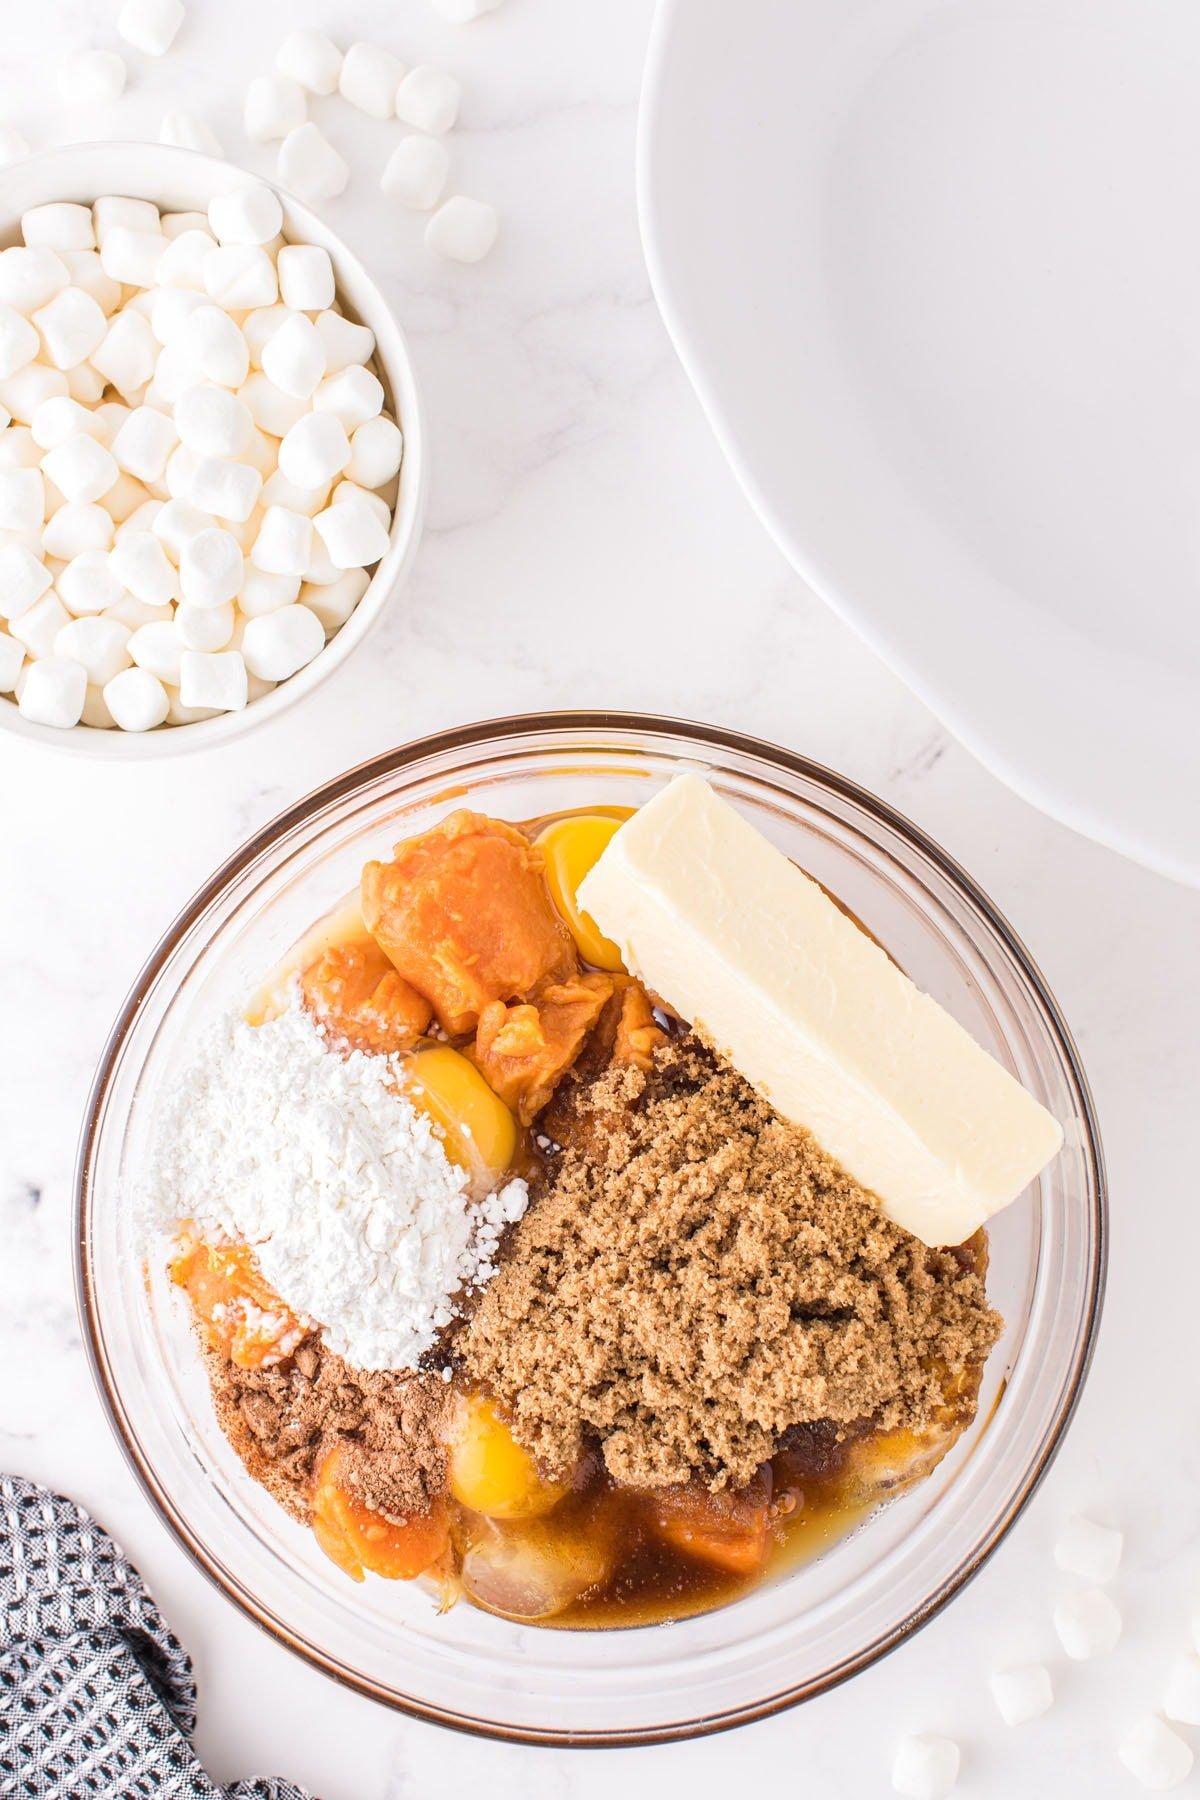 Beat together the sweet potatoes, eggs, dark brown sugar, butter, orange juice, cornstarch, and nutmeg